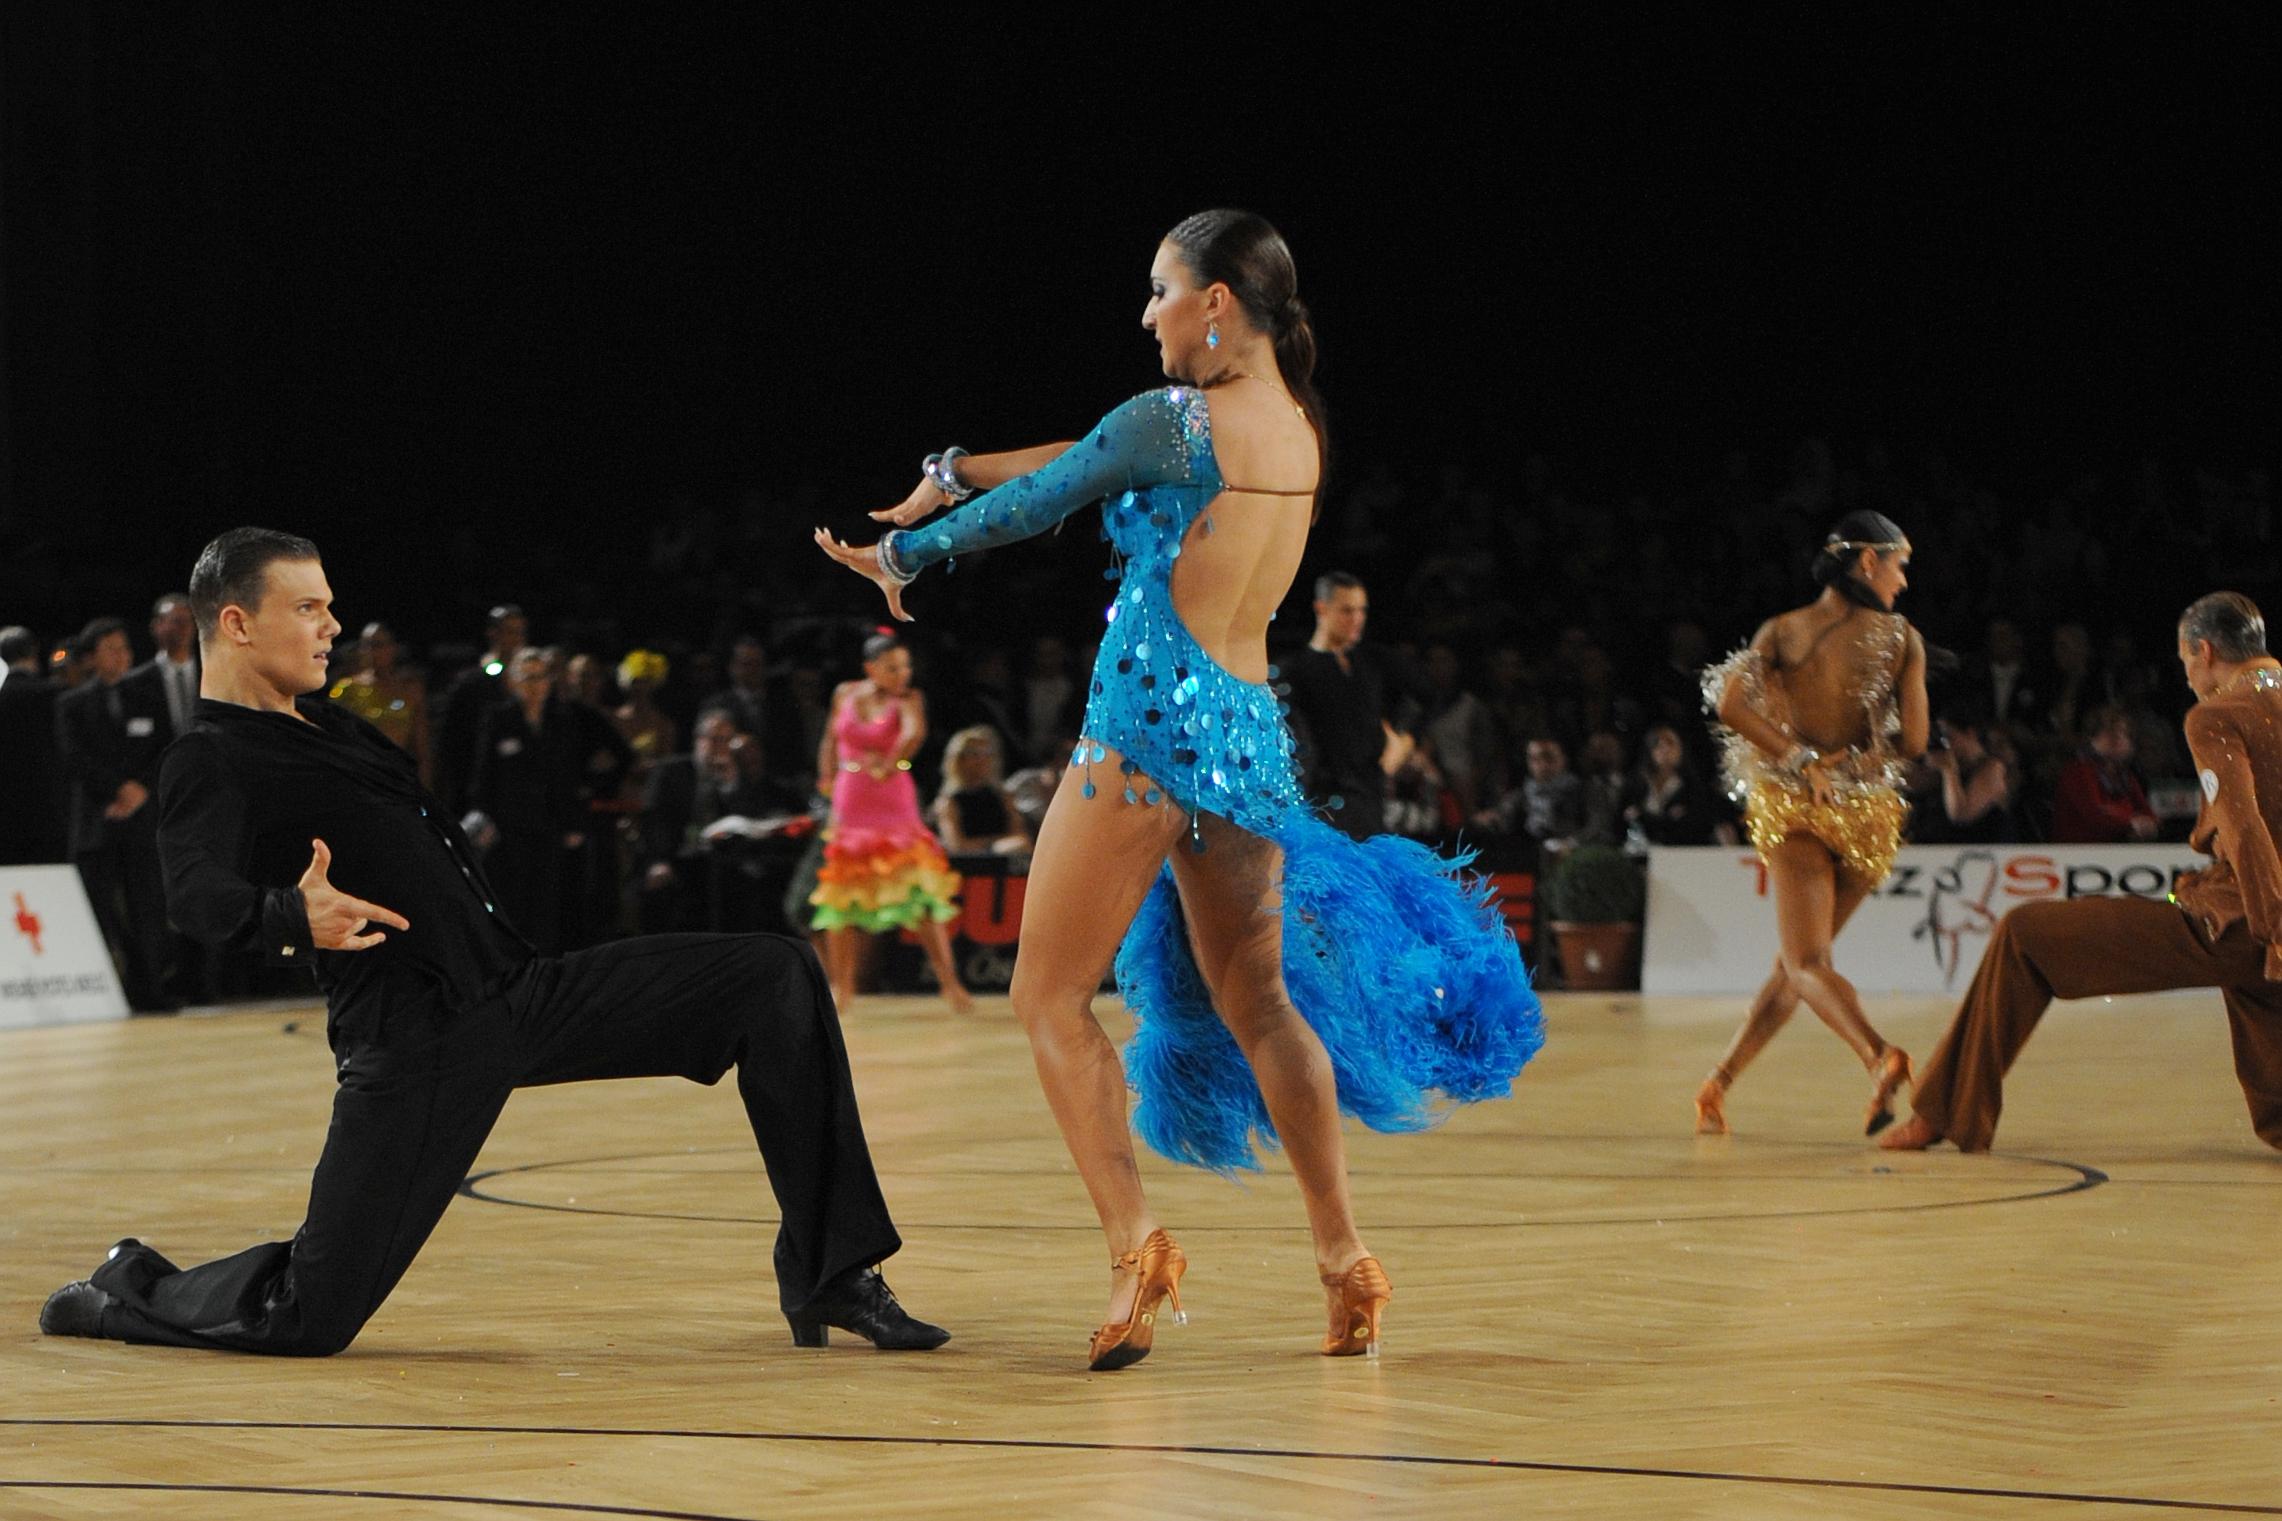 Paso Doble - Spanish Dance